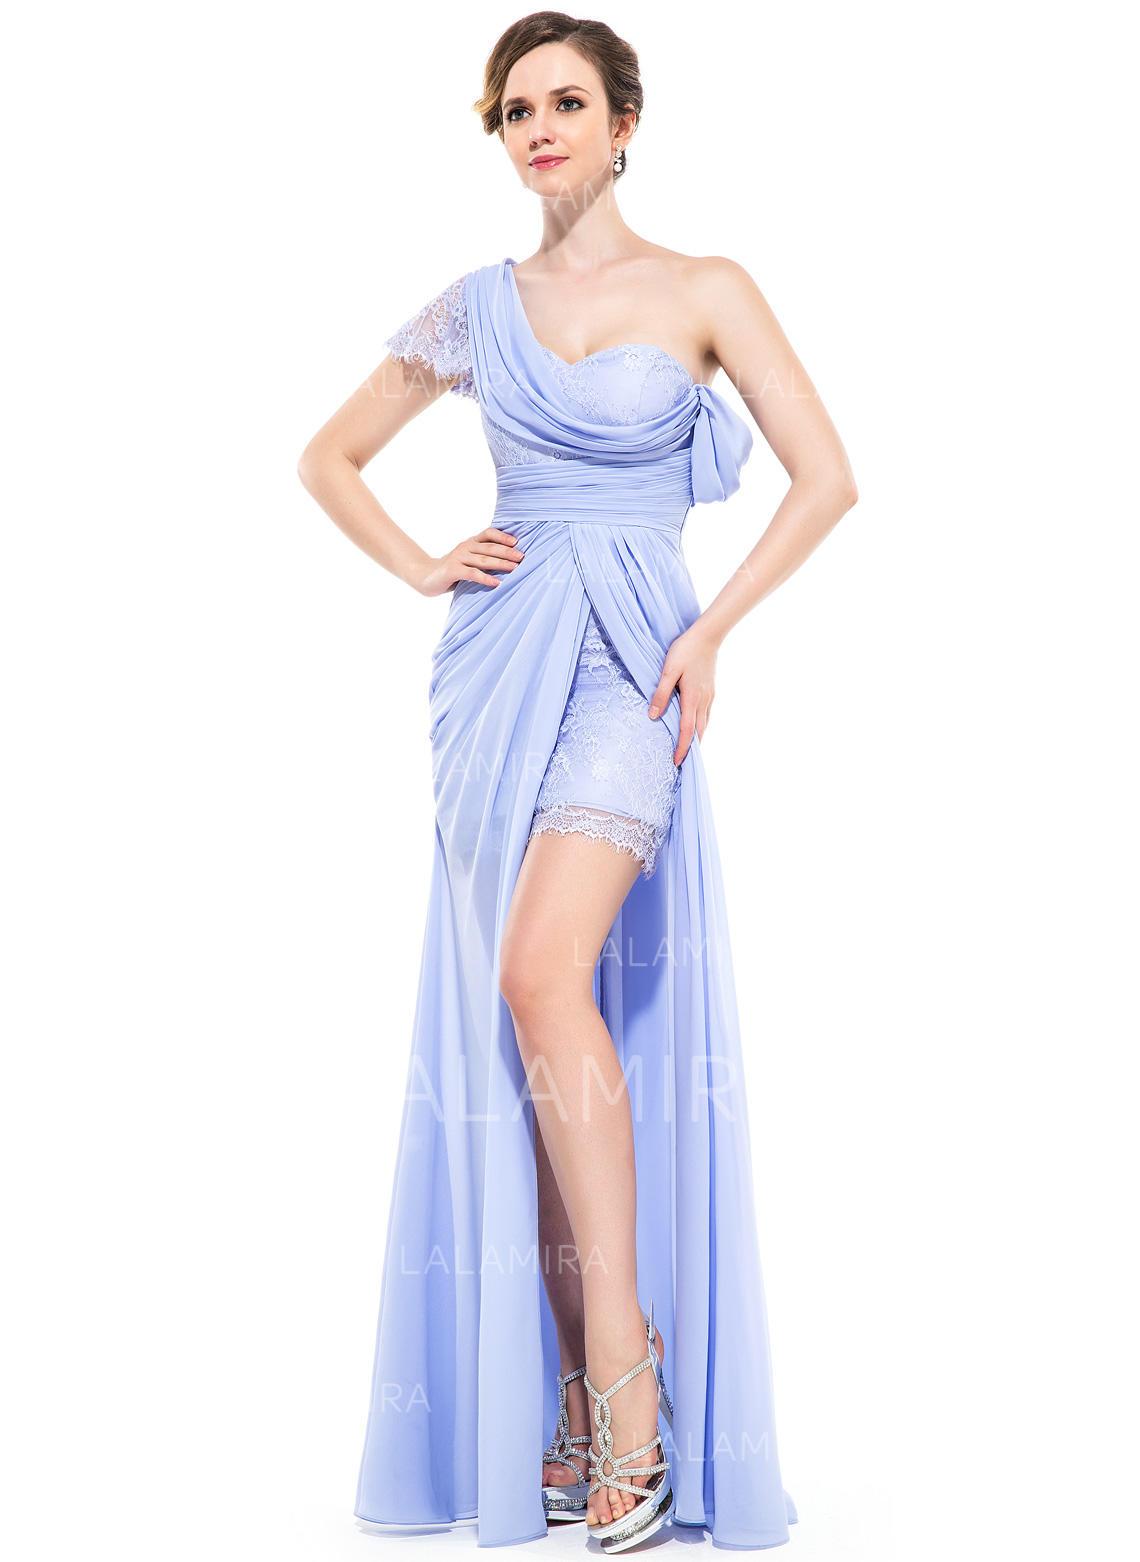 b0cf690d402 A-Line Princess Chiffon Prom Dresses Ruffle Split Front One-Shoulder Short  Sleeves. Loading zoom